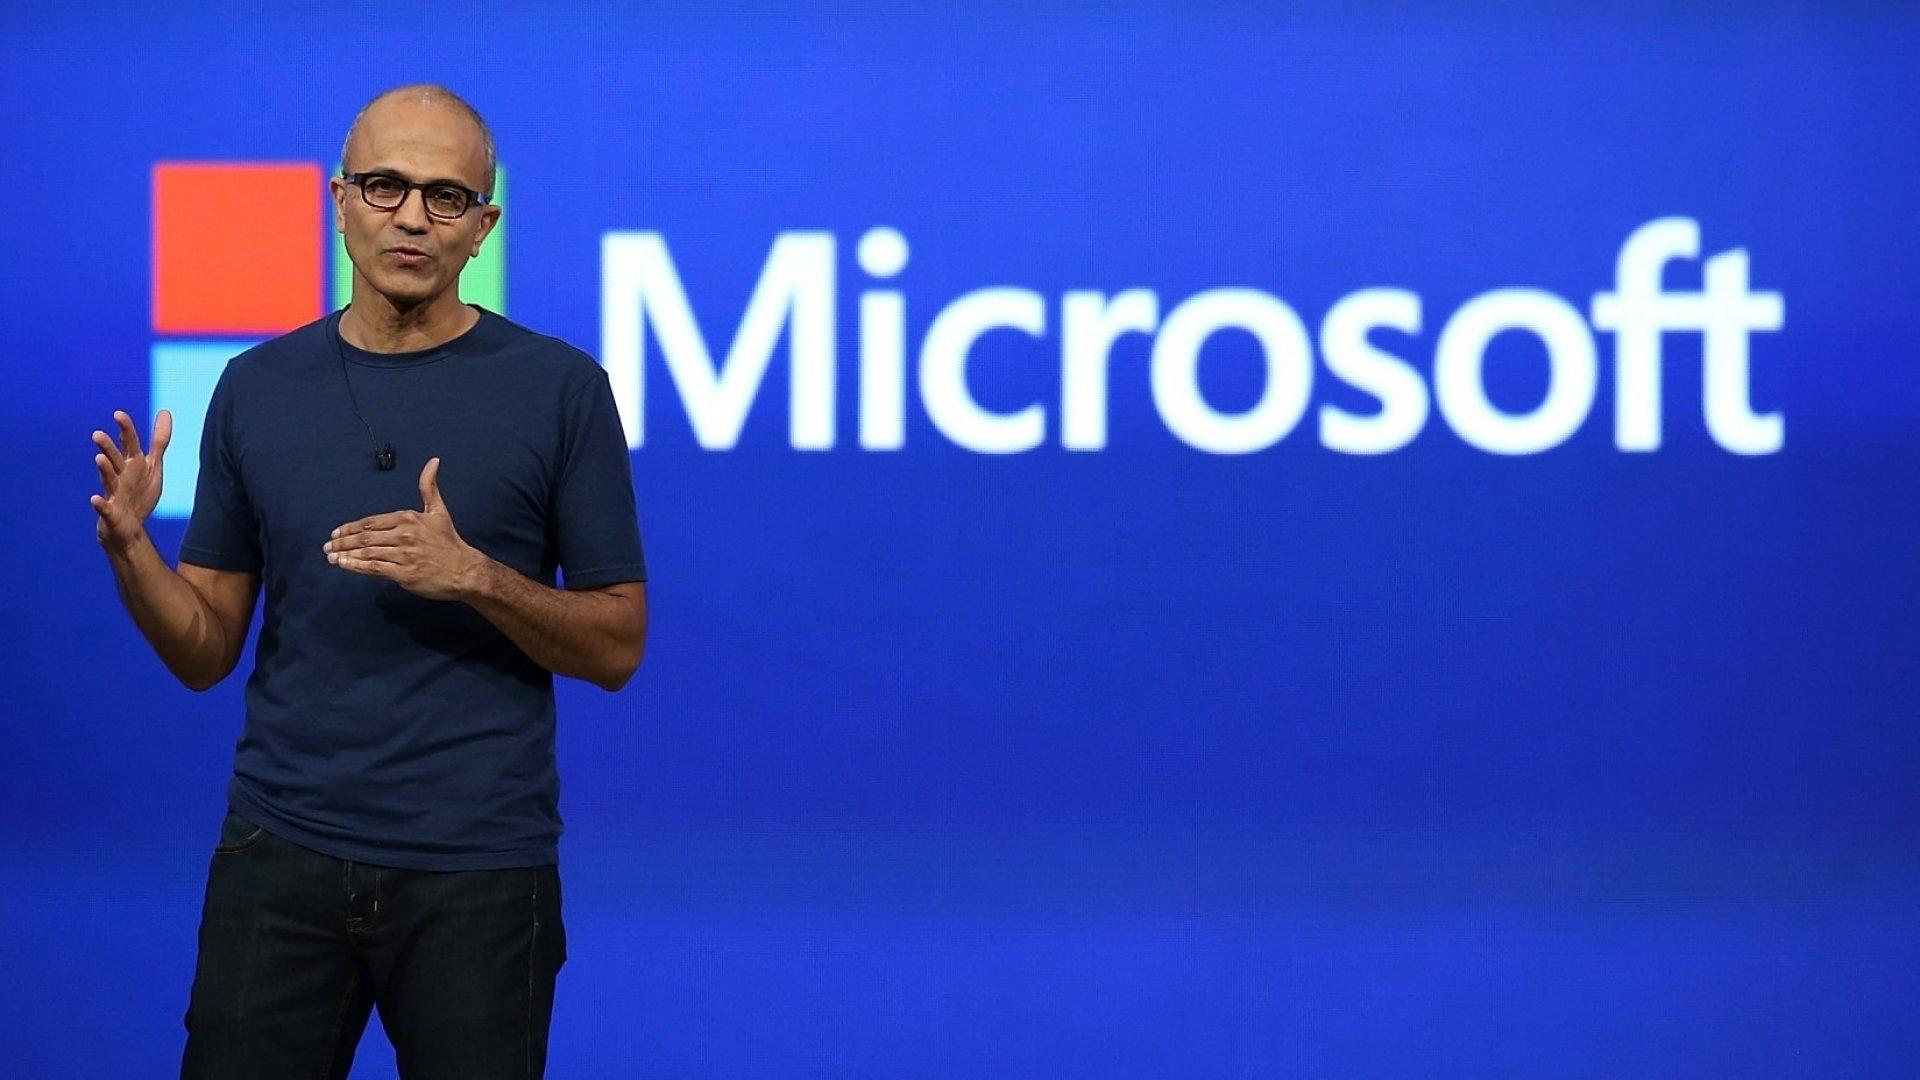 Microsoft Just Won the Cloud Wars